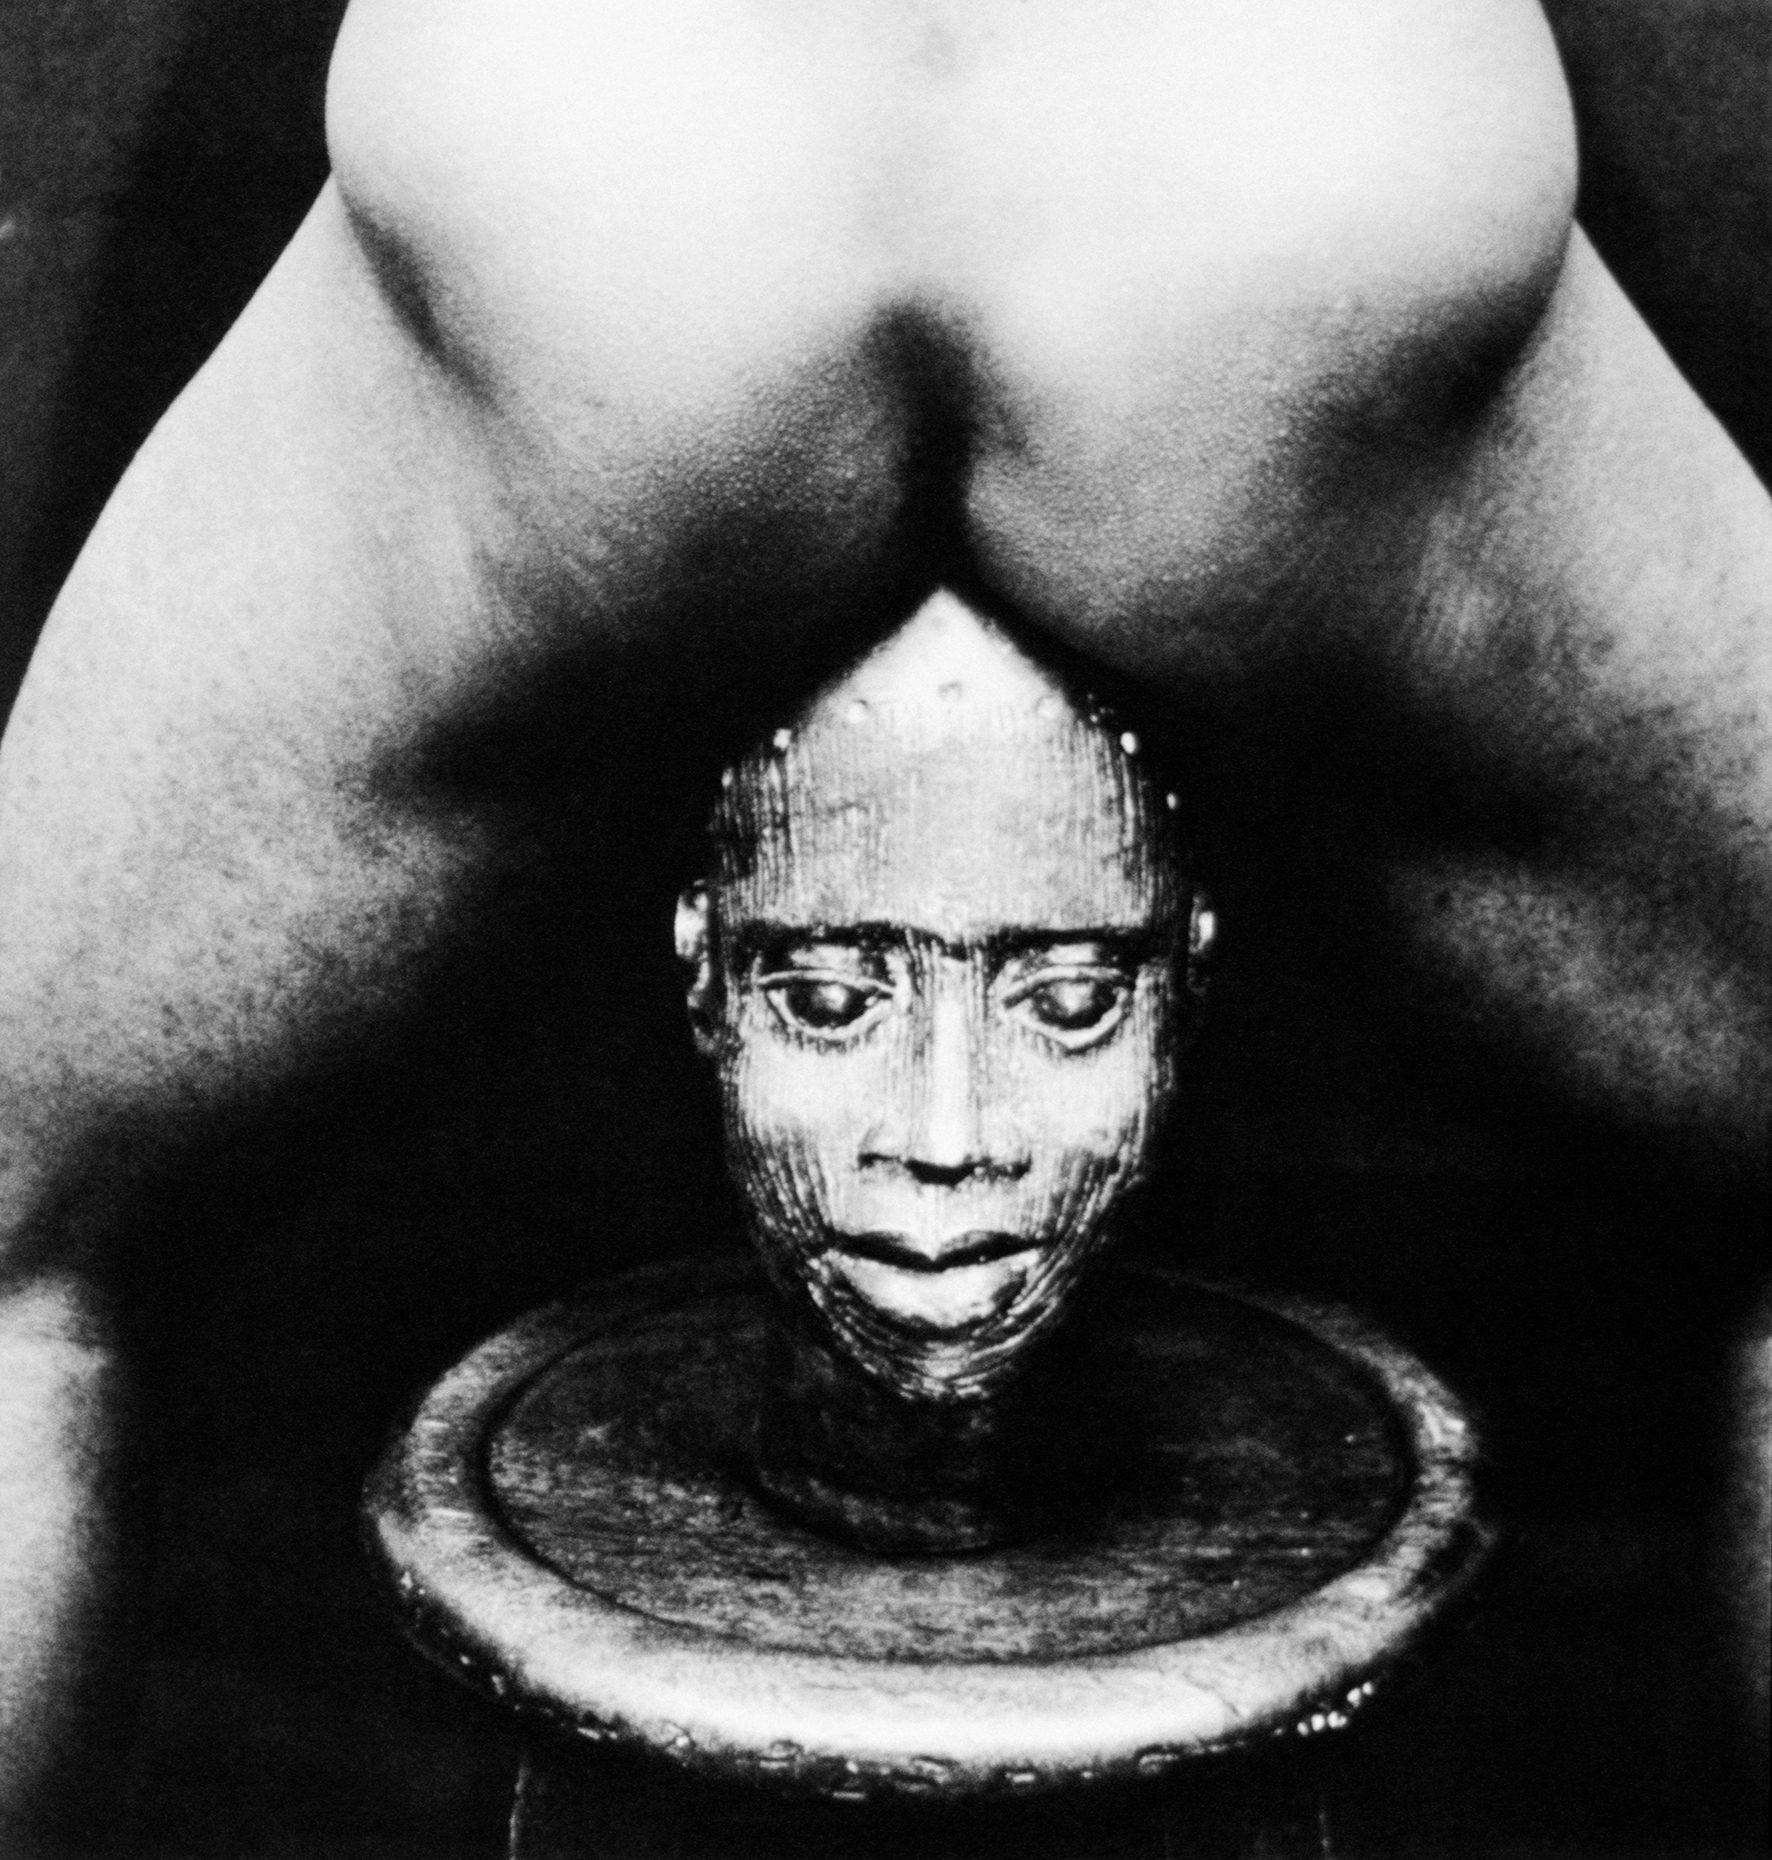 Rotimi Fani-Kayode, Bronze Head, 1987 © Rotimi Fani-Kayode. Courtesy of Autograph ABP